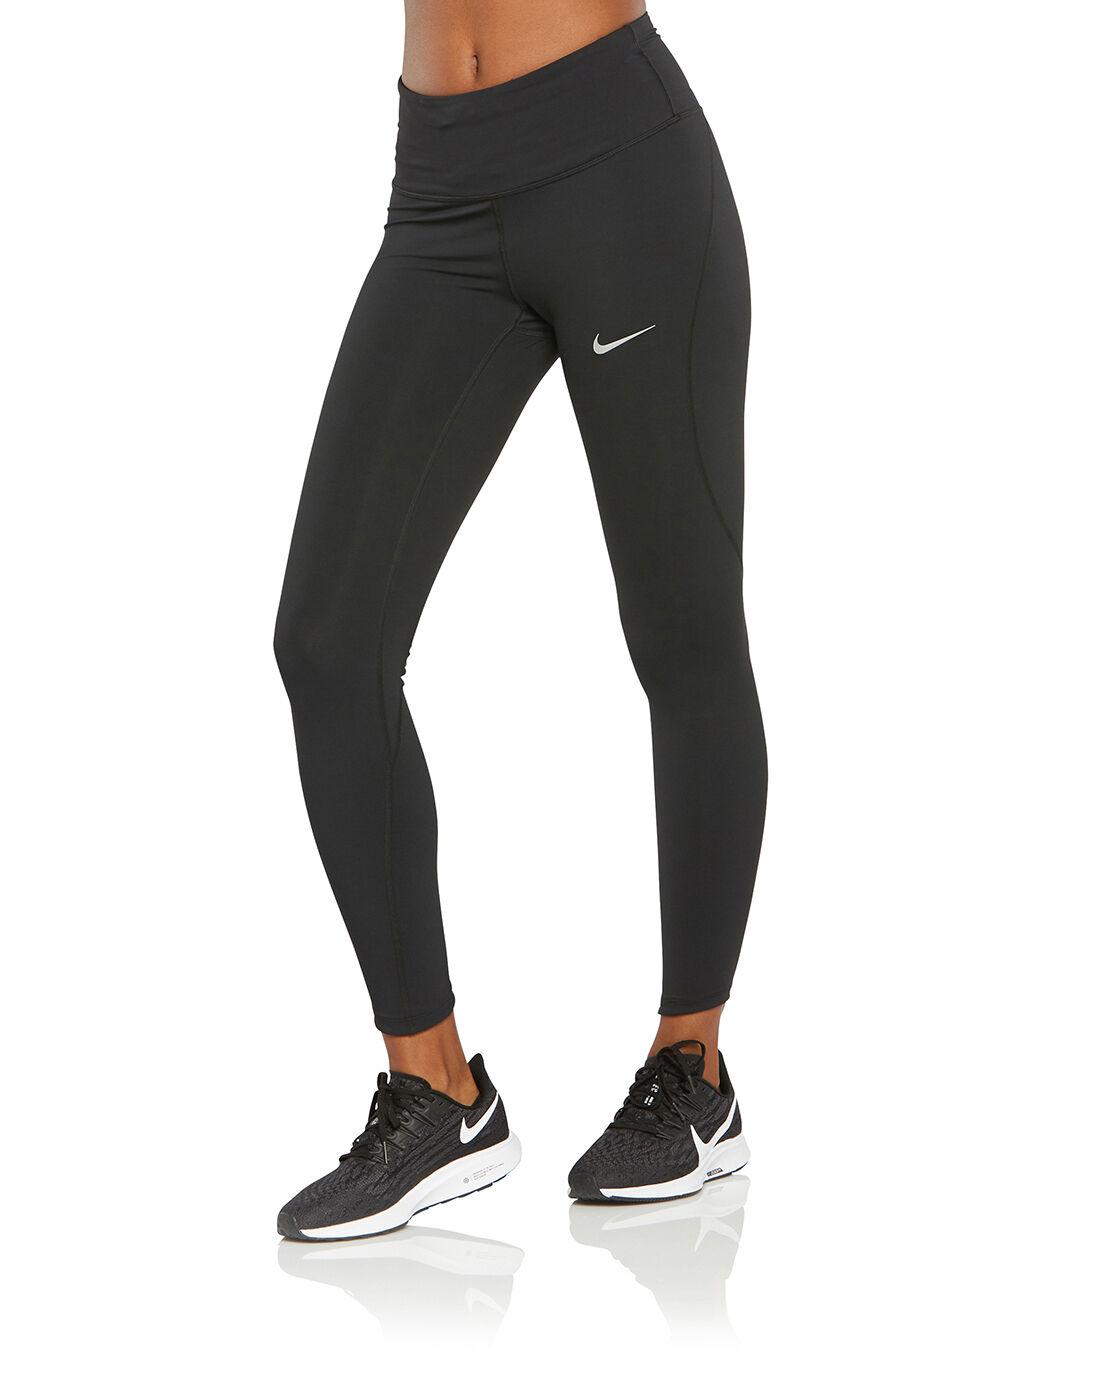 Nike Womens Epic Lux 7/8 Leggings